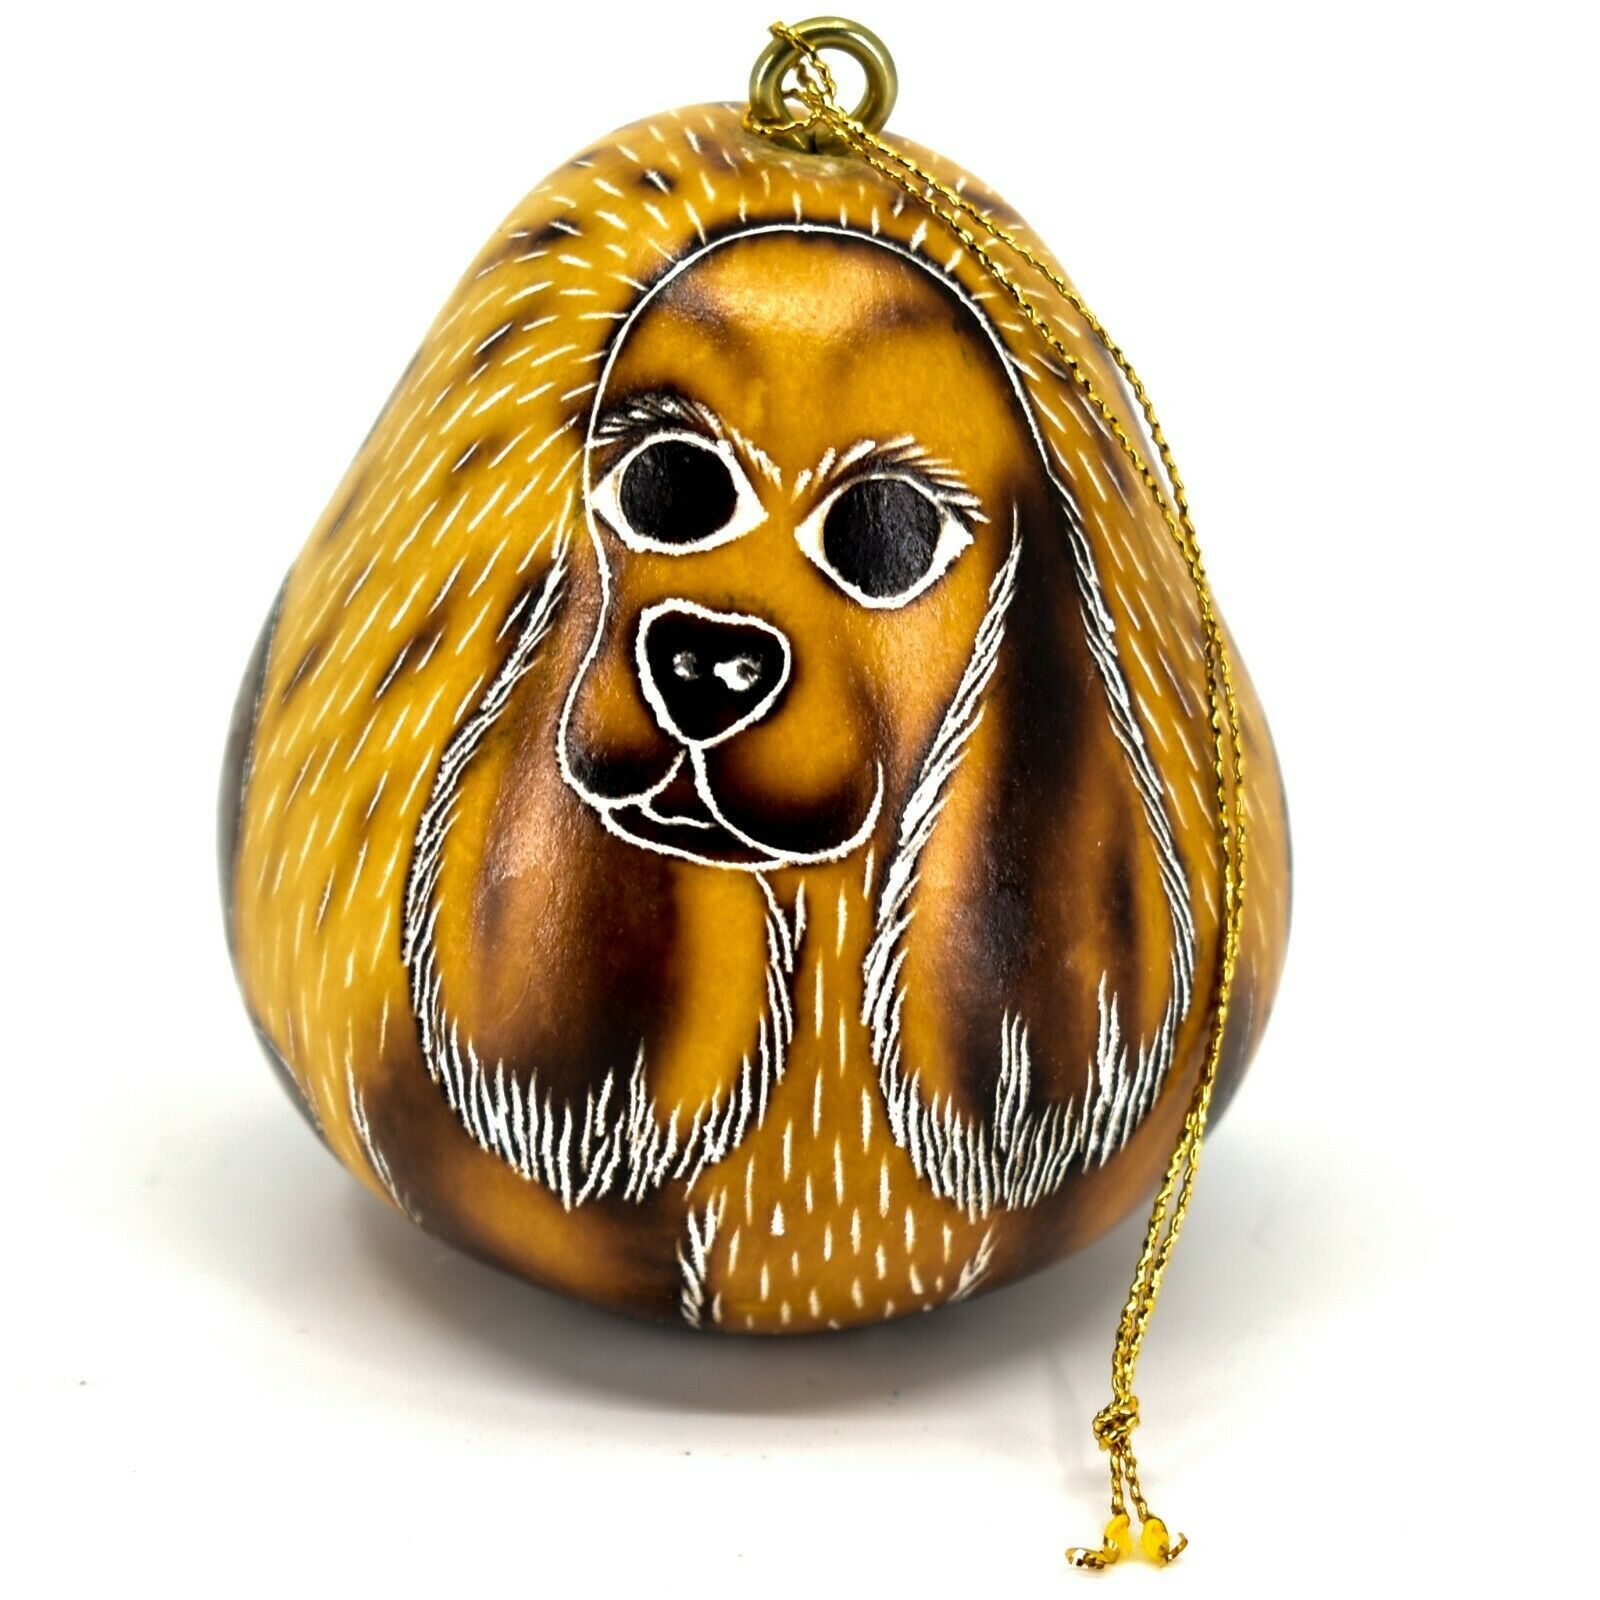 Handcrafted Carved Gourd Art Cocker Spaniel Puppy Dog Ornament Handmade in Peru